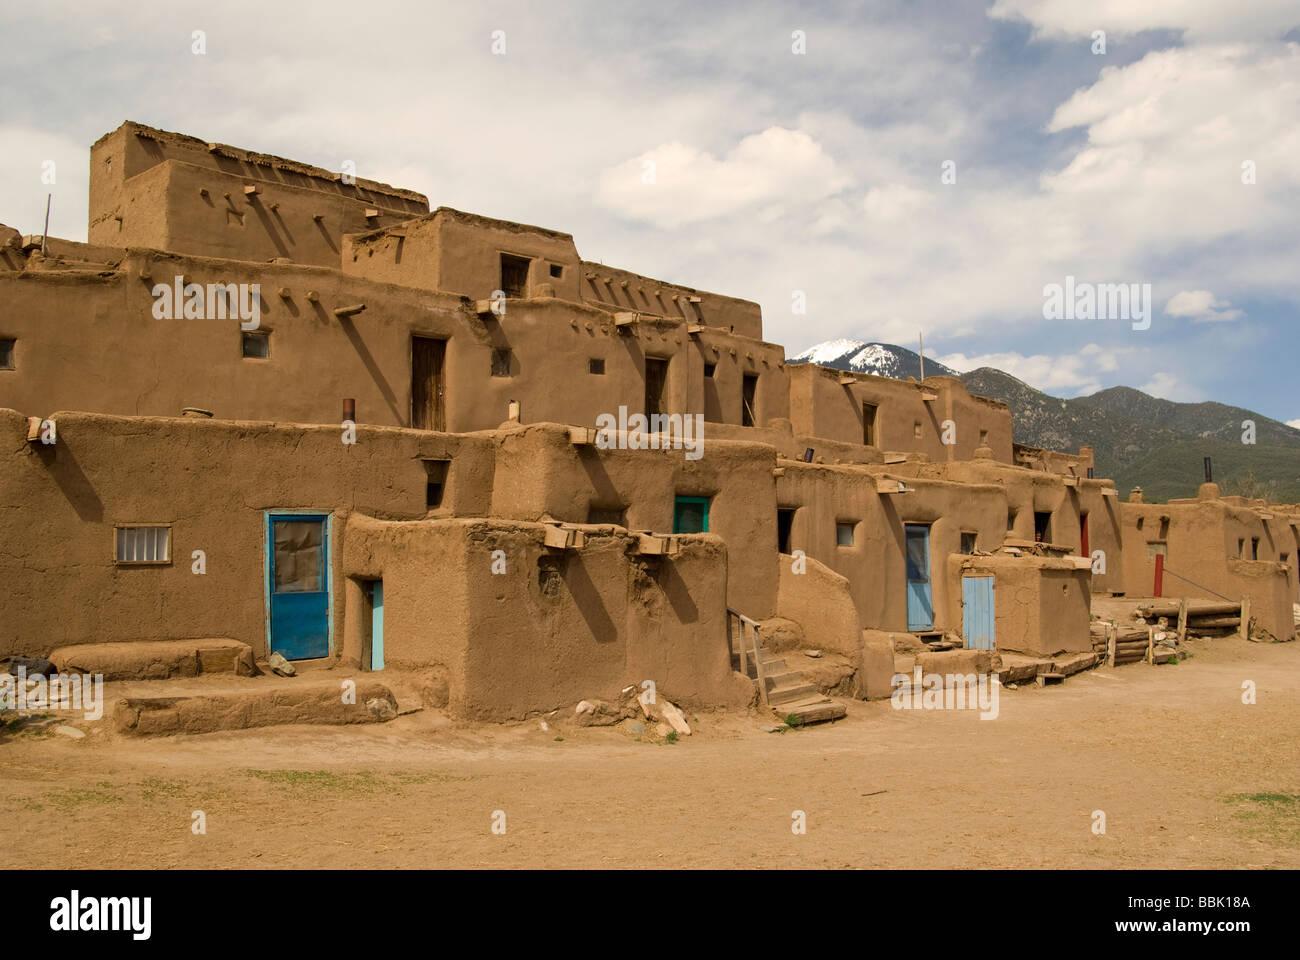 USA New Mexico Taos Pueblo - Stock Image